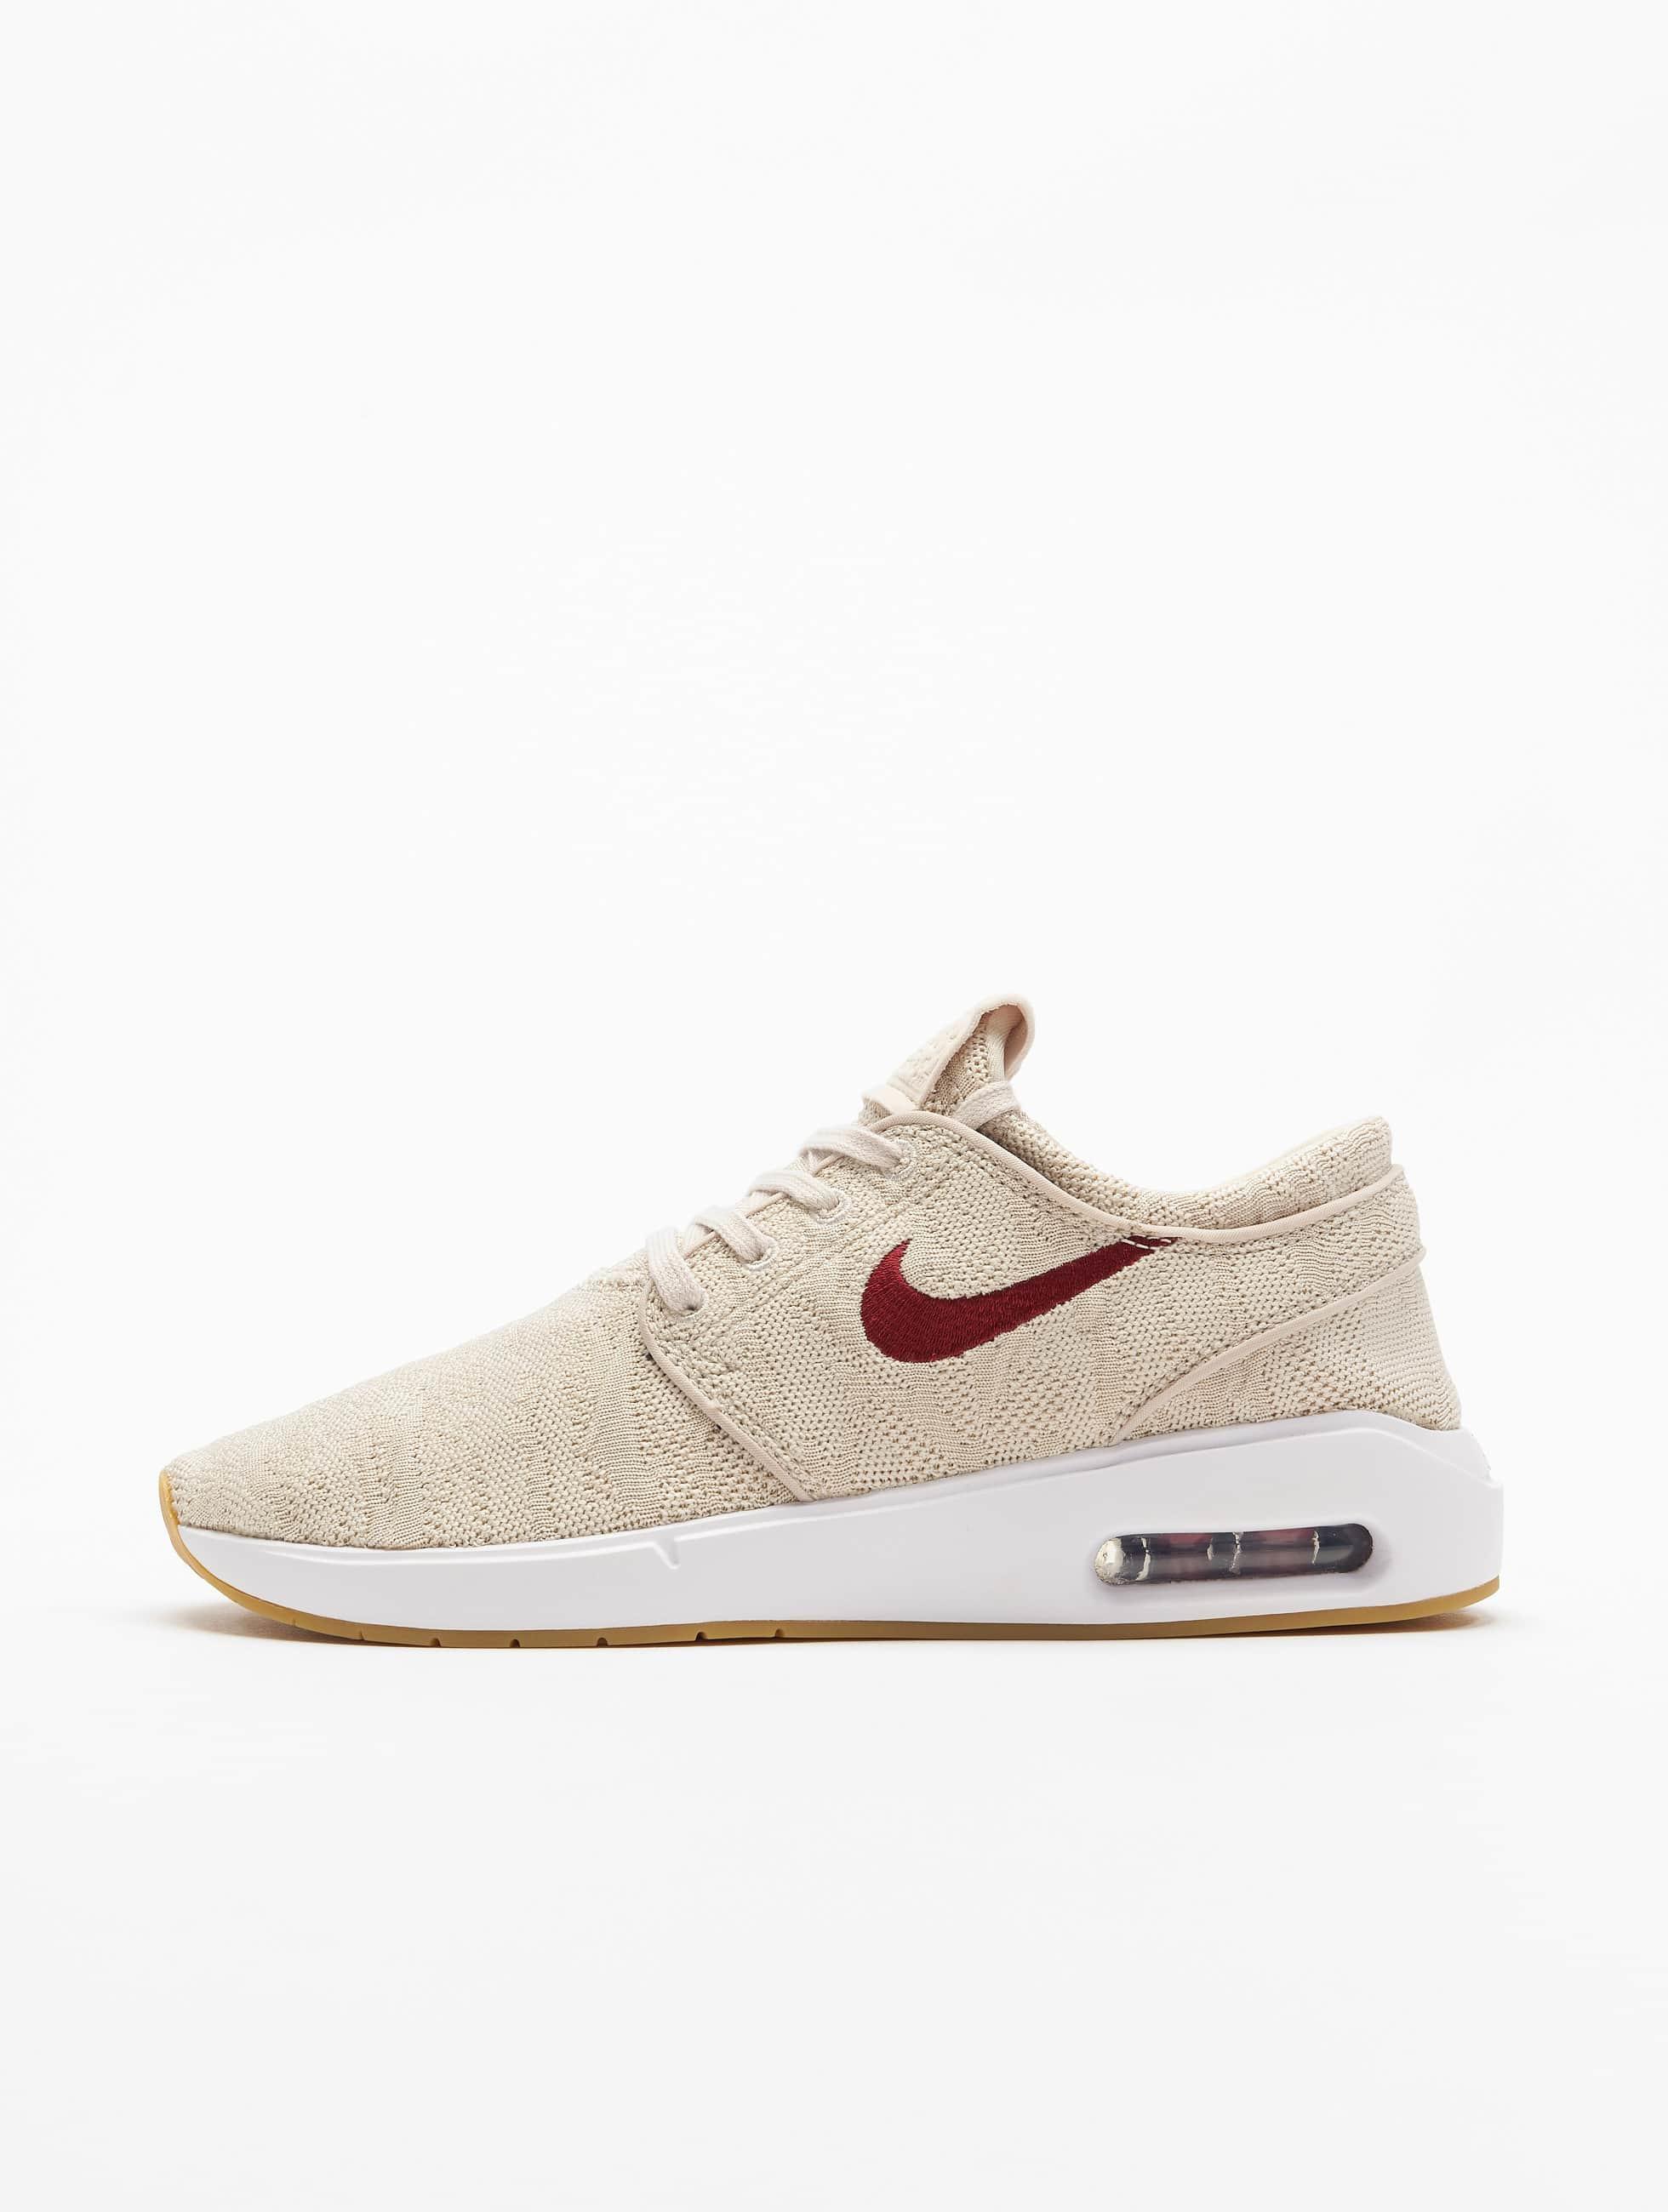 Nike SB Air Max Janoski 2 Sneakers Desert SandTeam RedObsidian